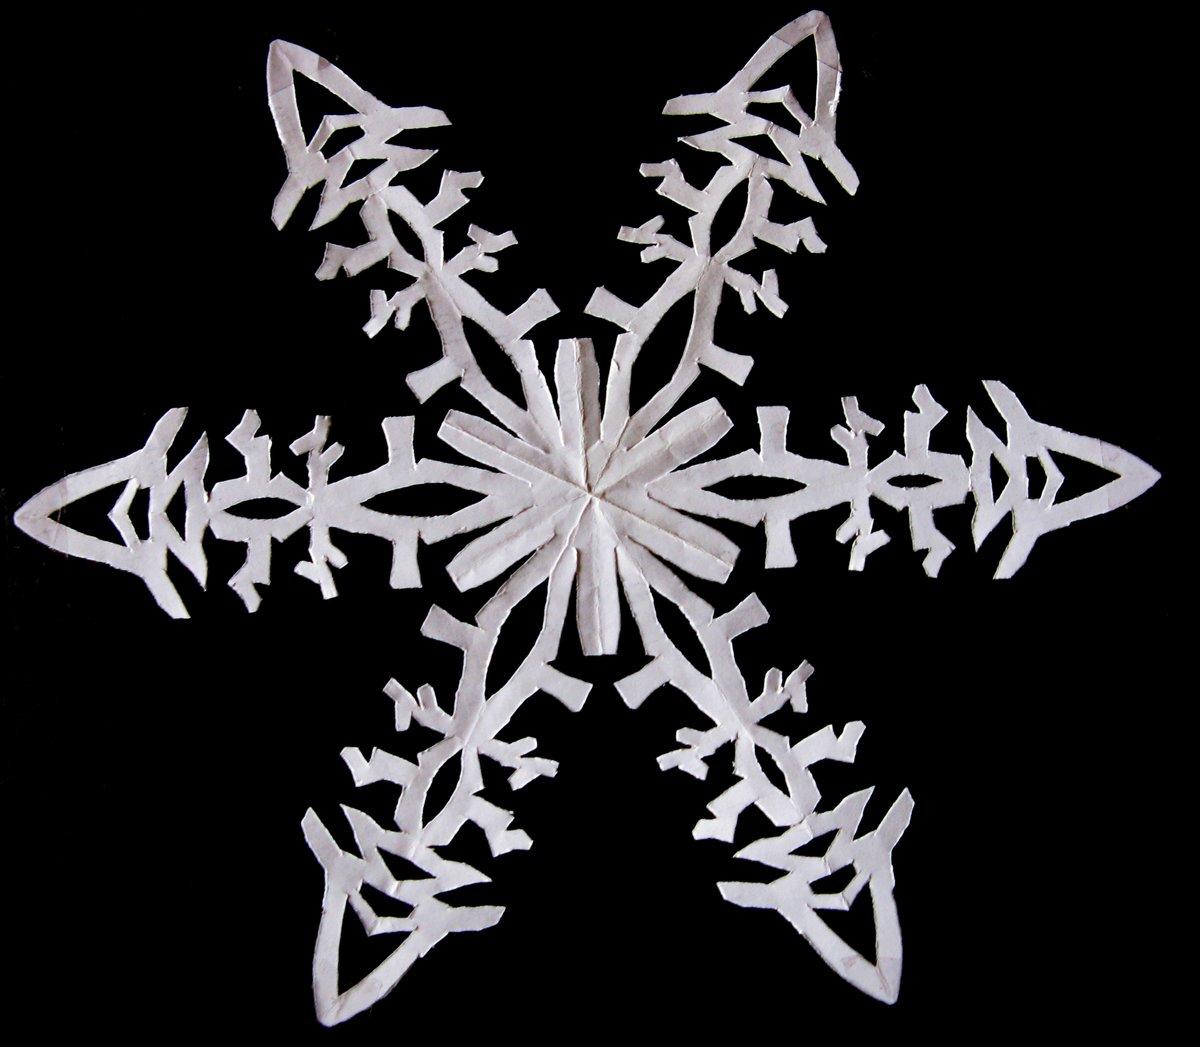 картинки легких снежинок